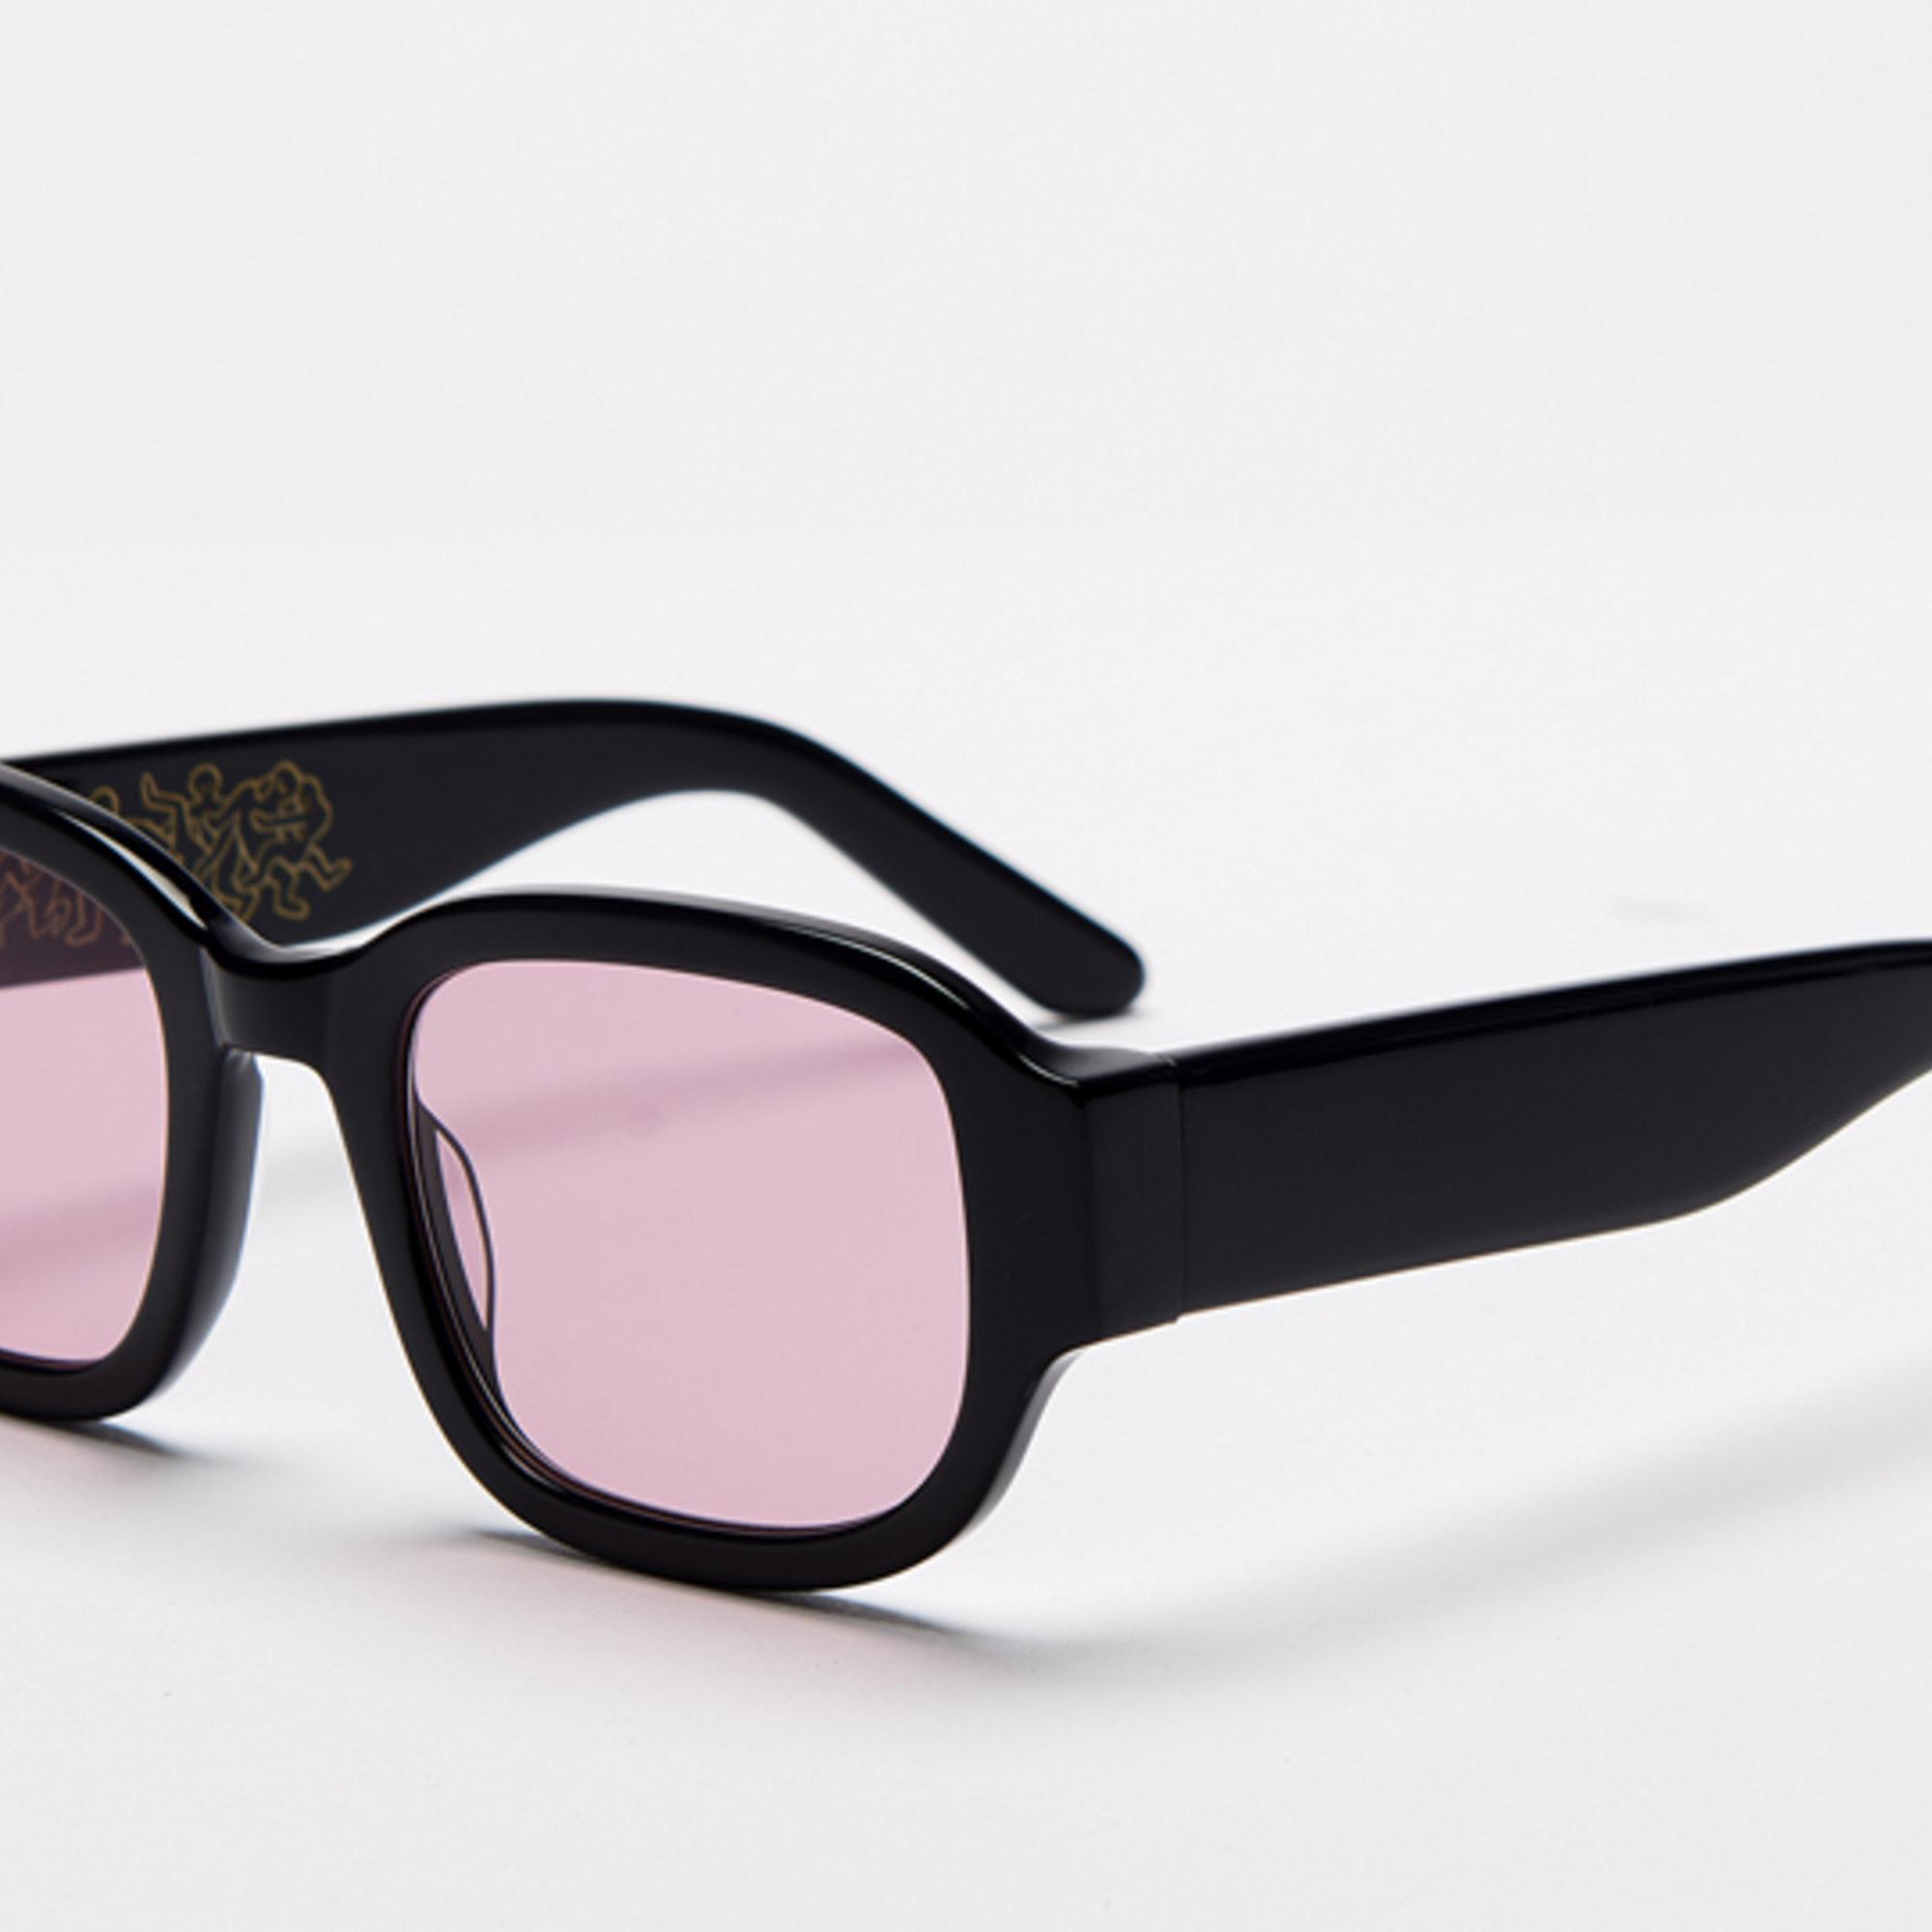 Ace & Tate Sunglasses | rectangle acetate in Black, Pink